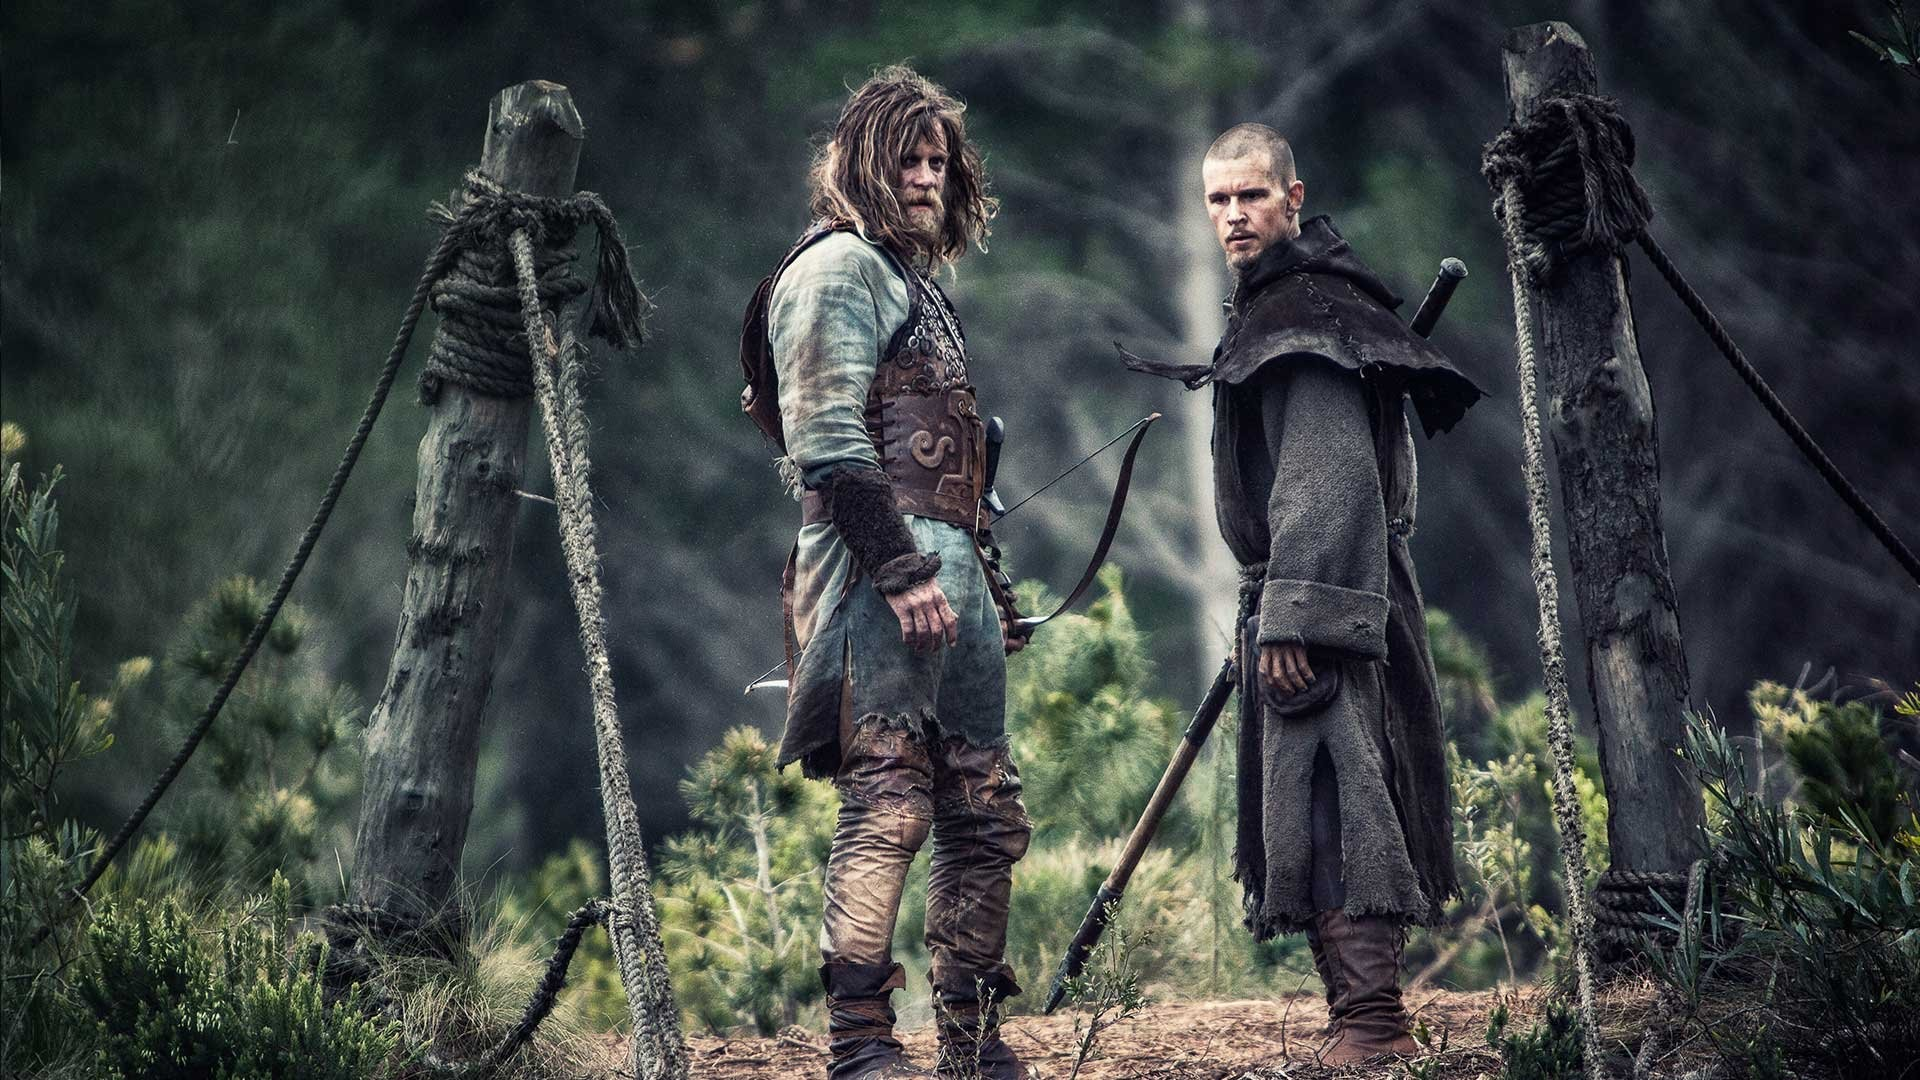 NORTHMEN VIKING SAGA fantasy action adventure history fighting 1northmen warrior  wallpaper     580227   WallpaperUP